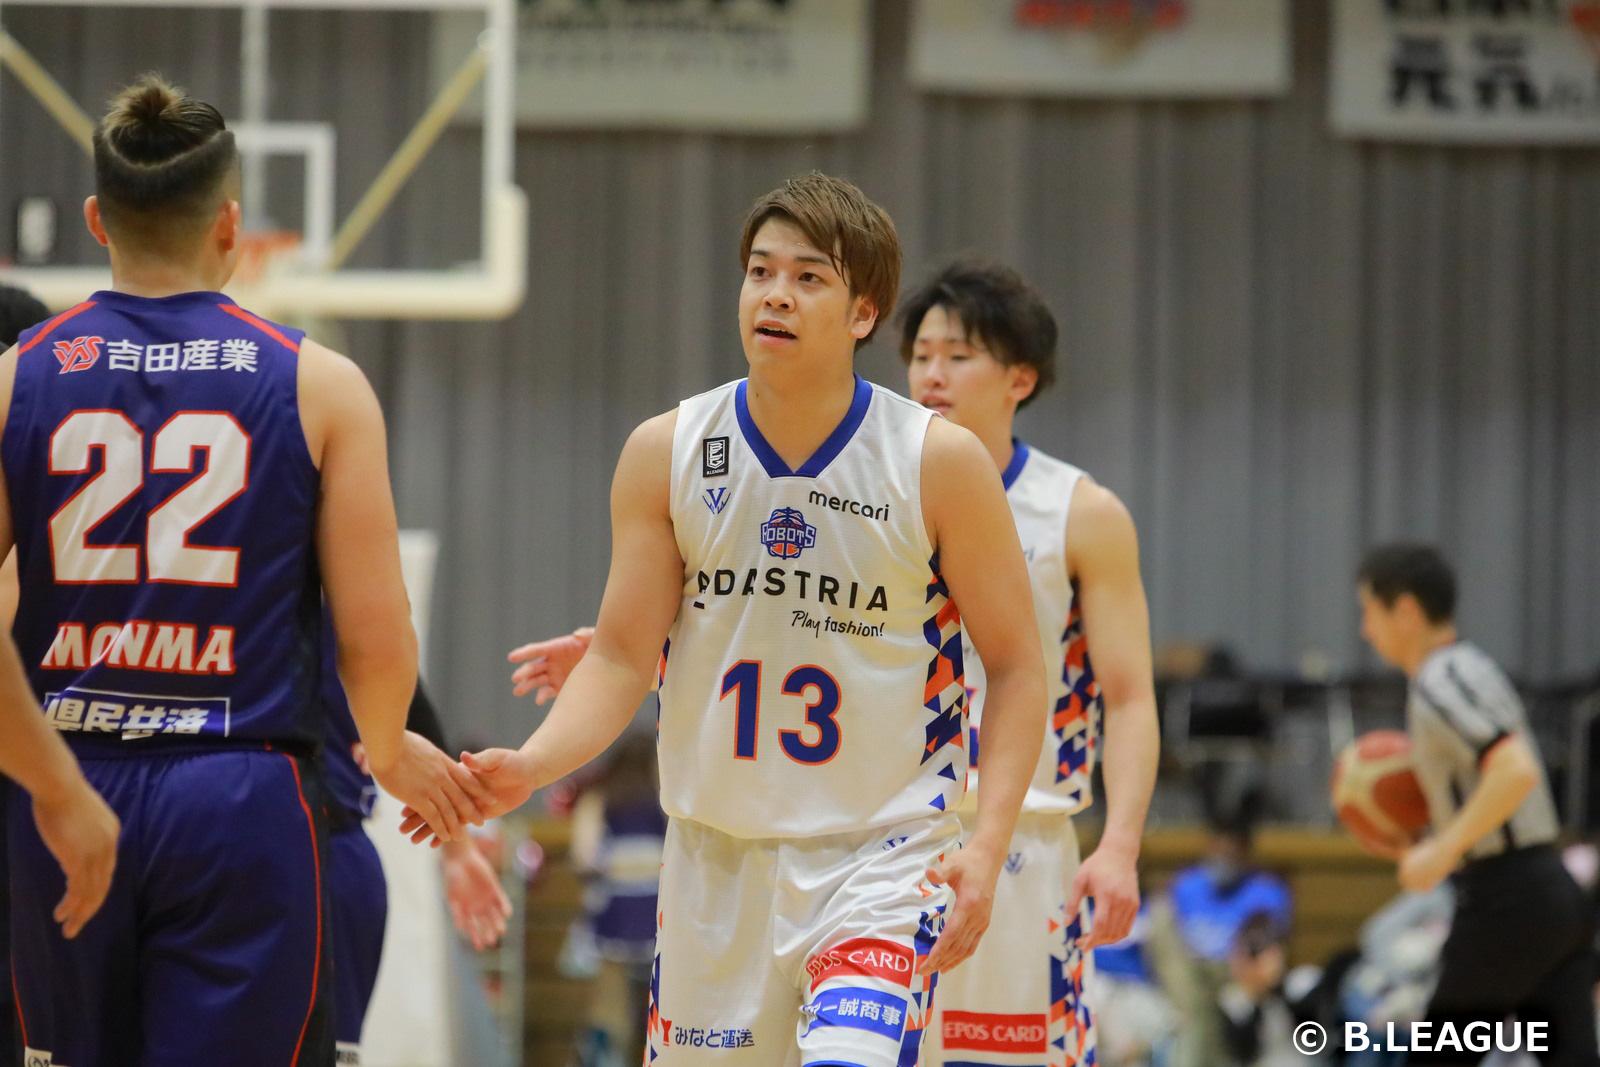 【AFTER GAME】 2020-21第12節 青森戦(12/12~13)~快勝のち辛勝。自分たちのバスケットを通しきって~